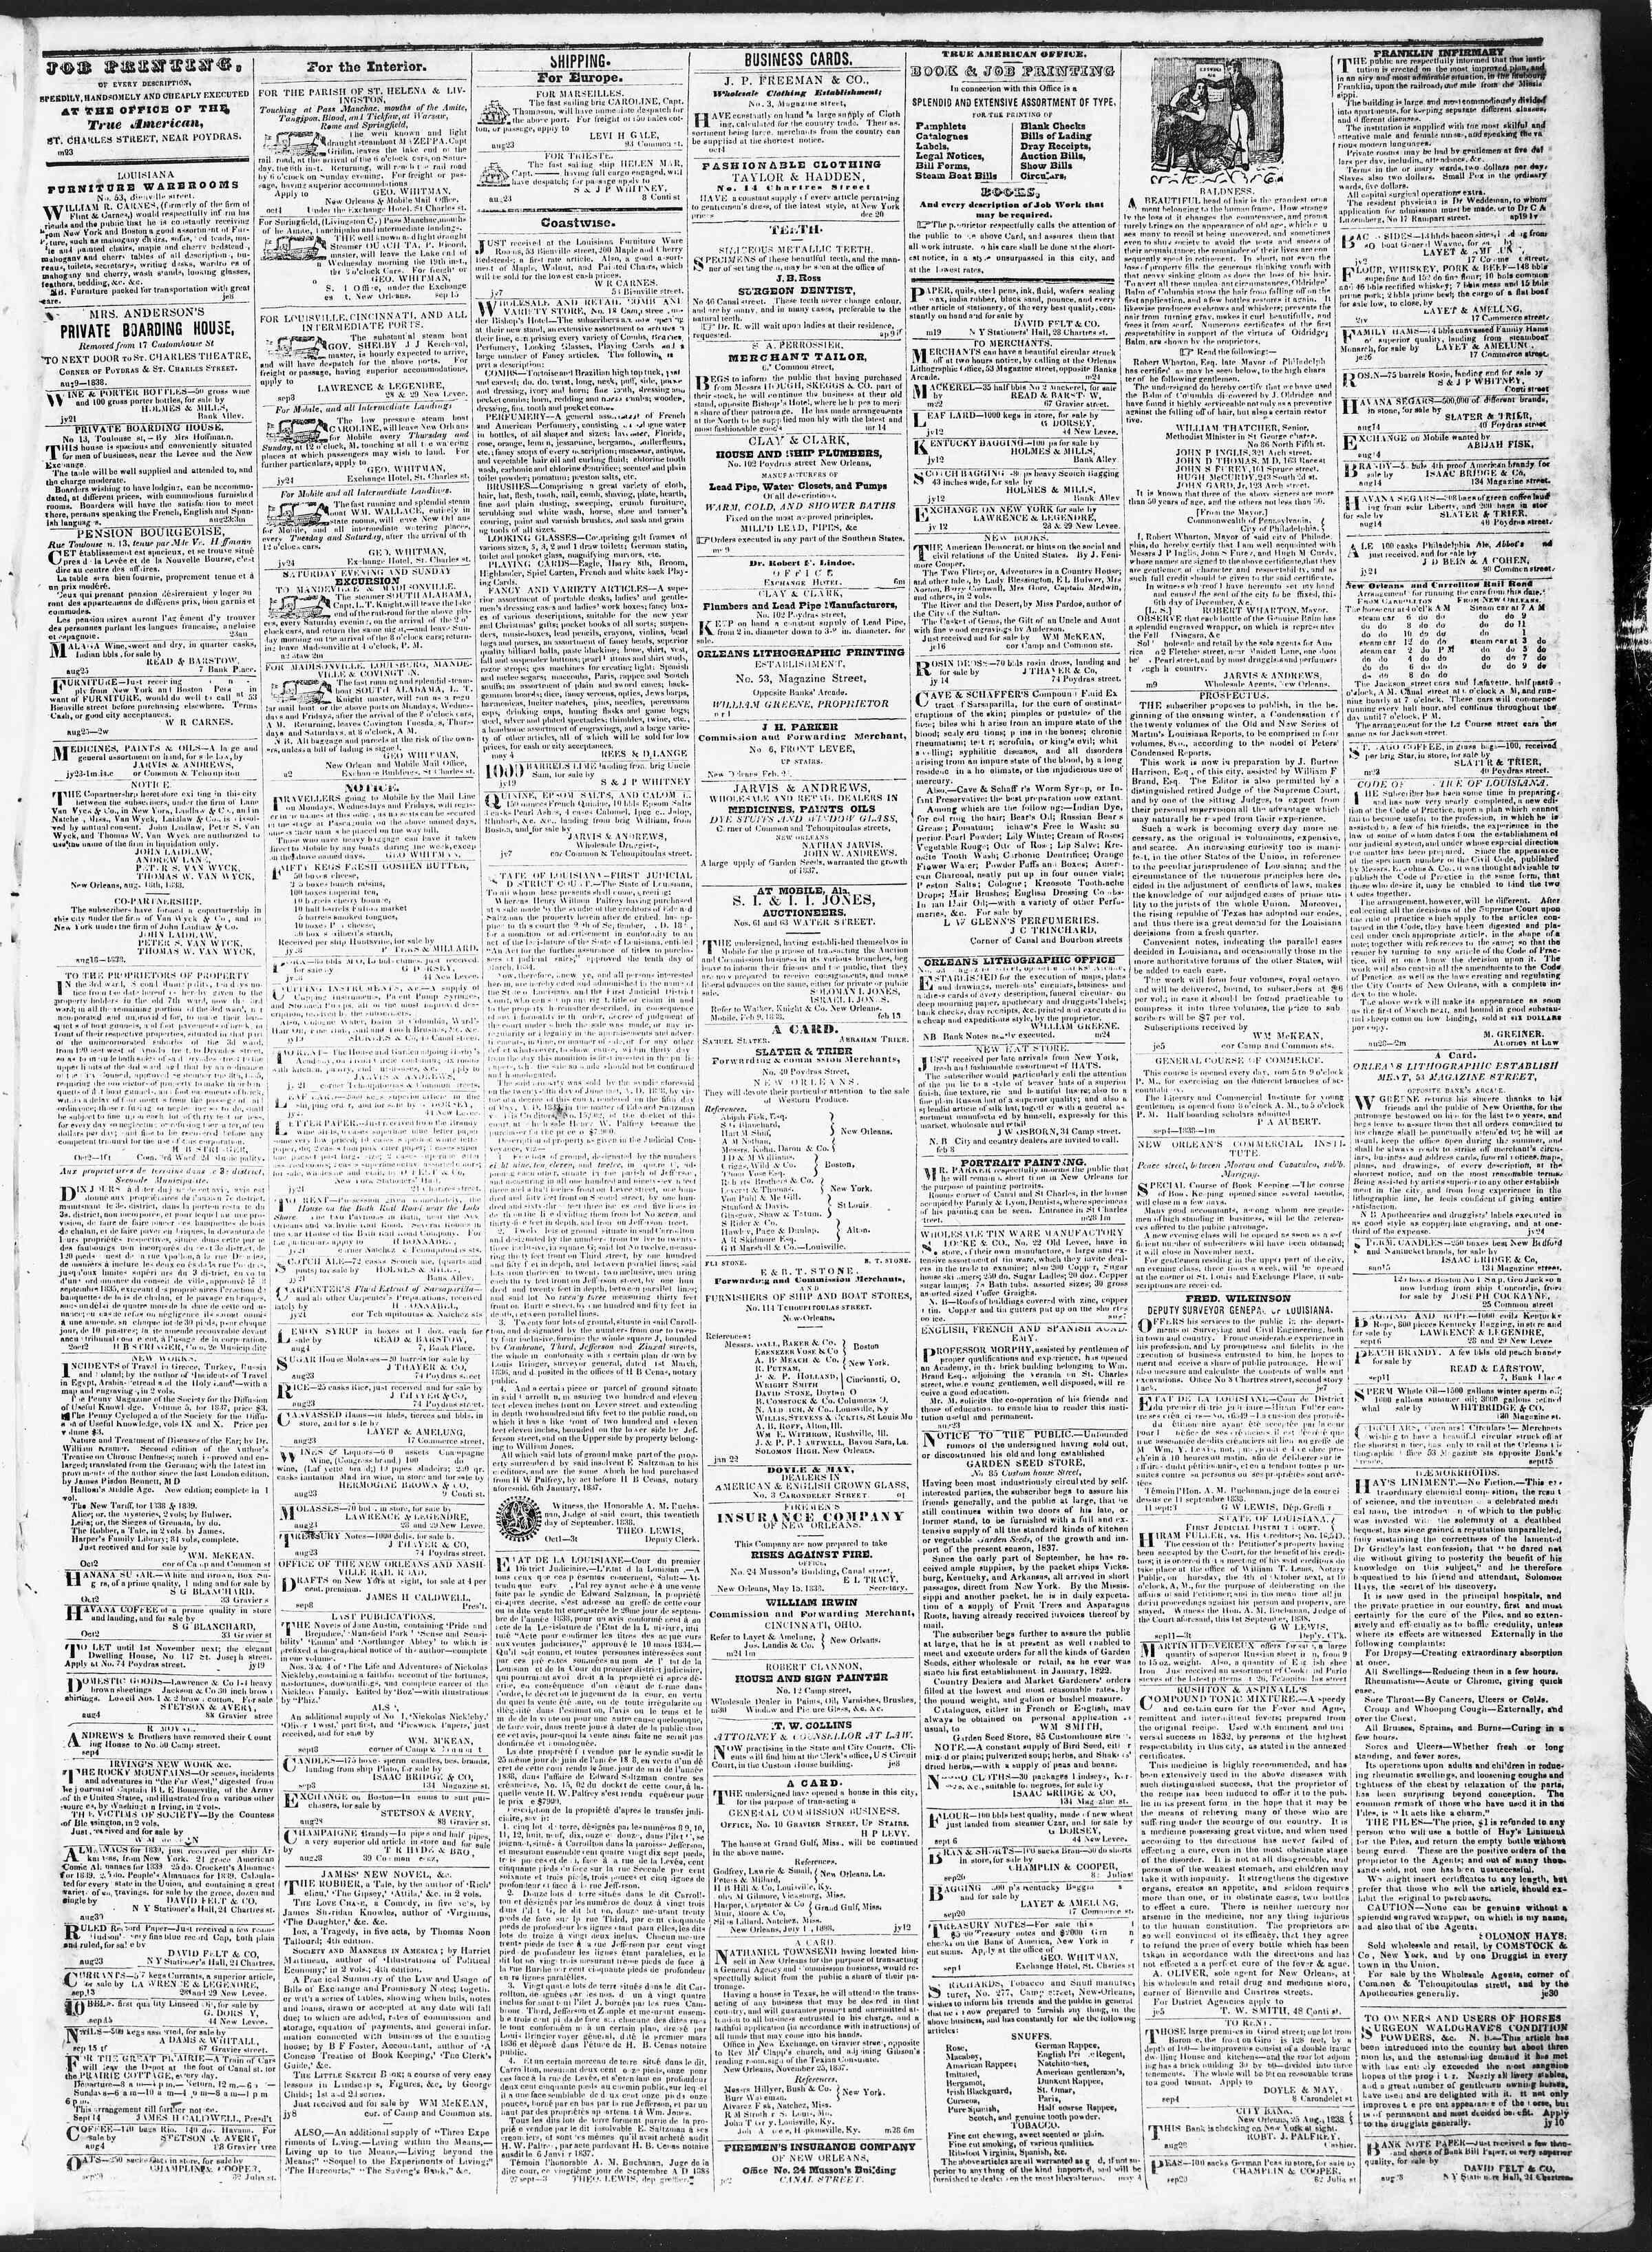 October 5, 1838 Tarihli True American Gazetesi Sayfa 3